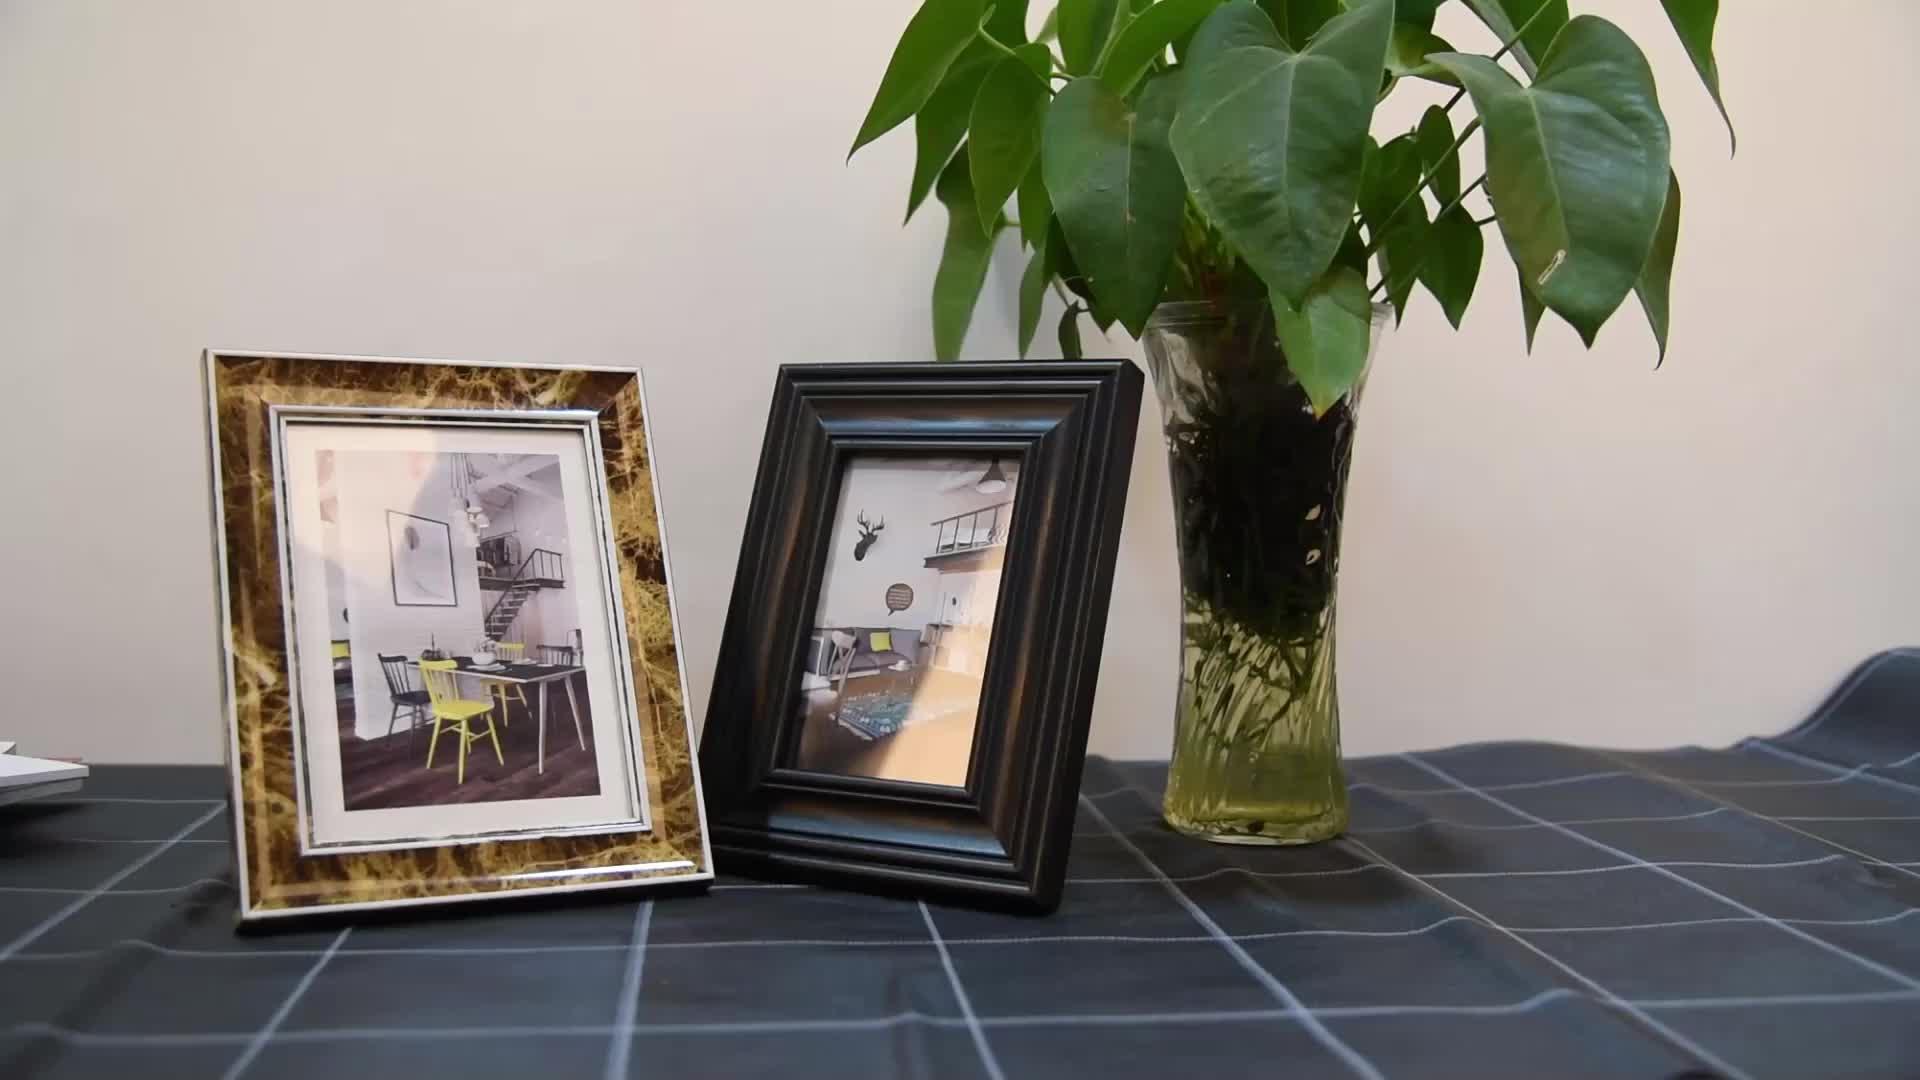 Premium Quality Modern Classical Matt Golden Painting Art PS Frame Moulding for Home Decor